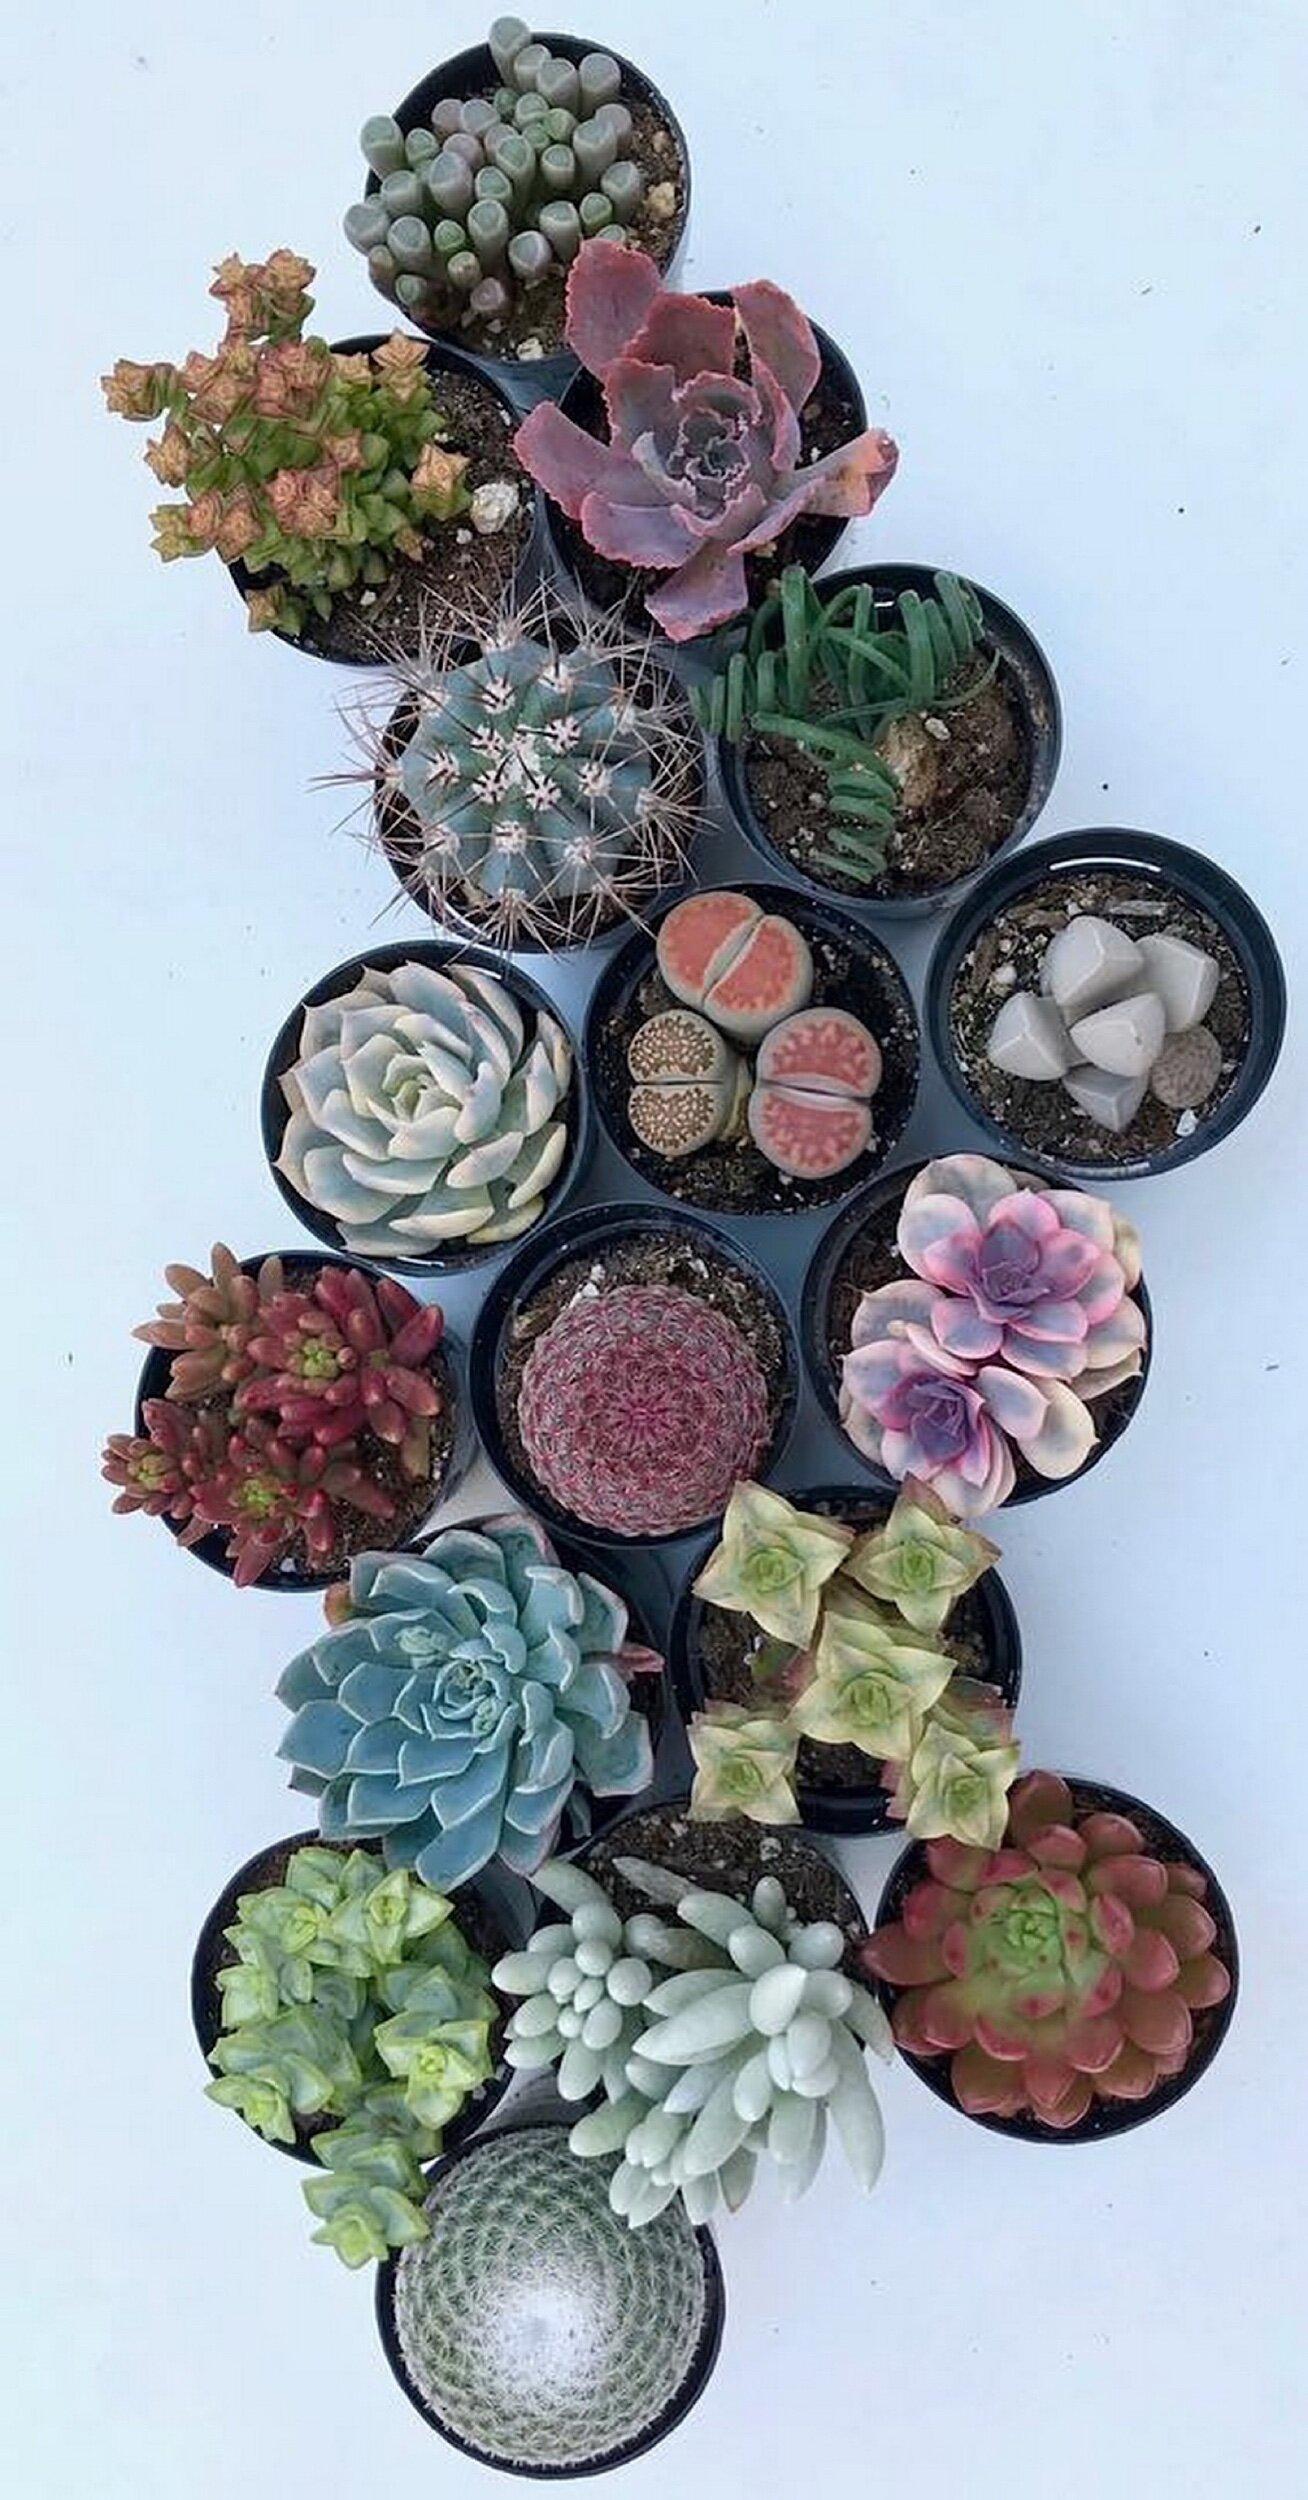 50 Gorgeous Succulent Garden Ideas @fairyblooms